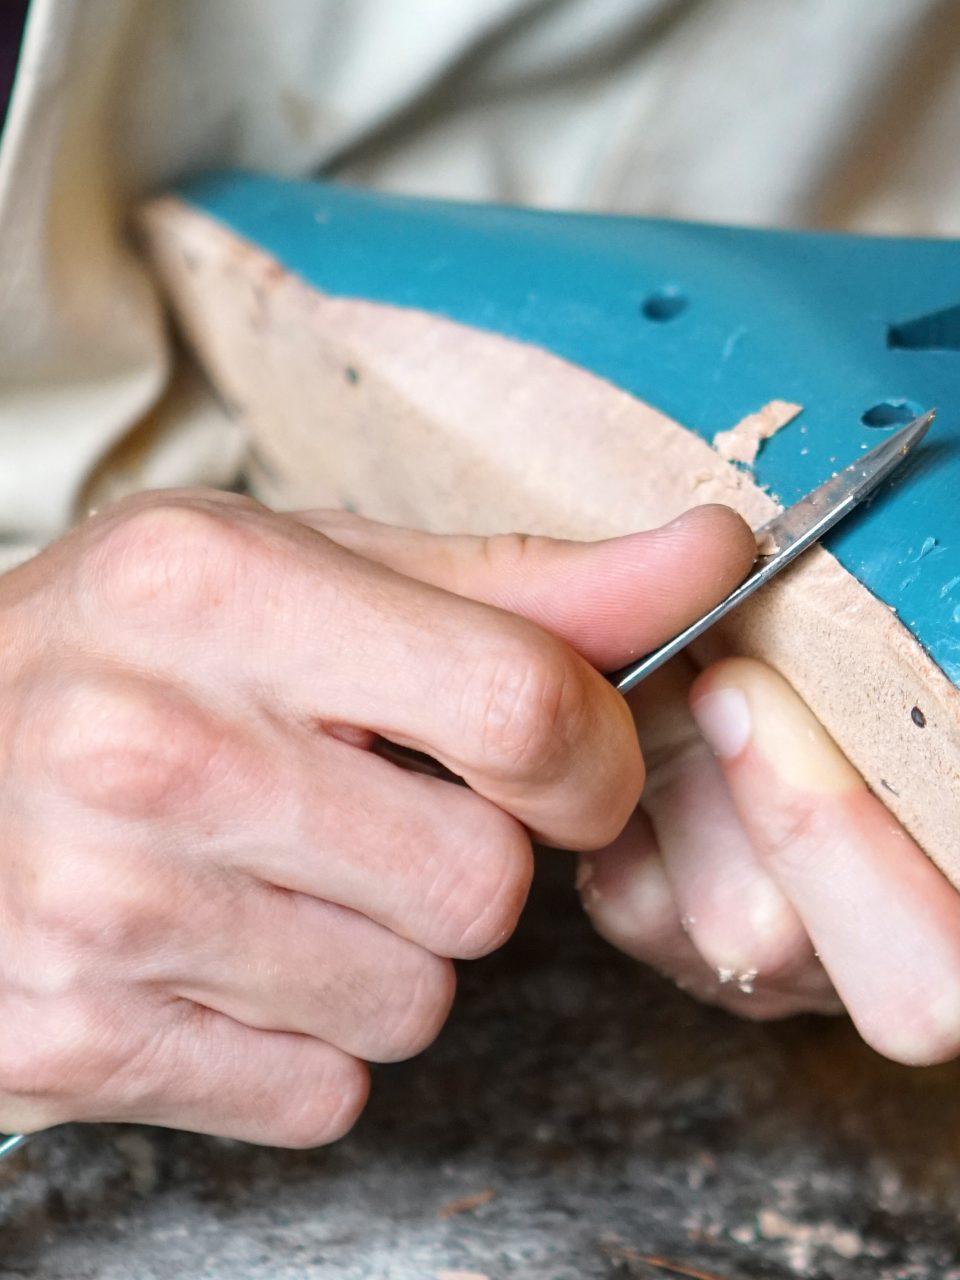 Gibt es nachhaltig produzierte Schuhe? -Fotocredit: Raoul Ortega/Unsplash